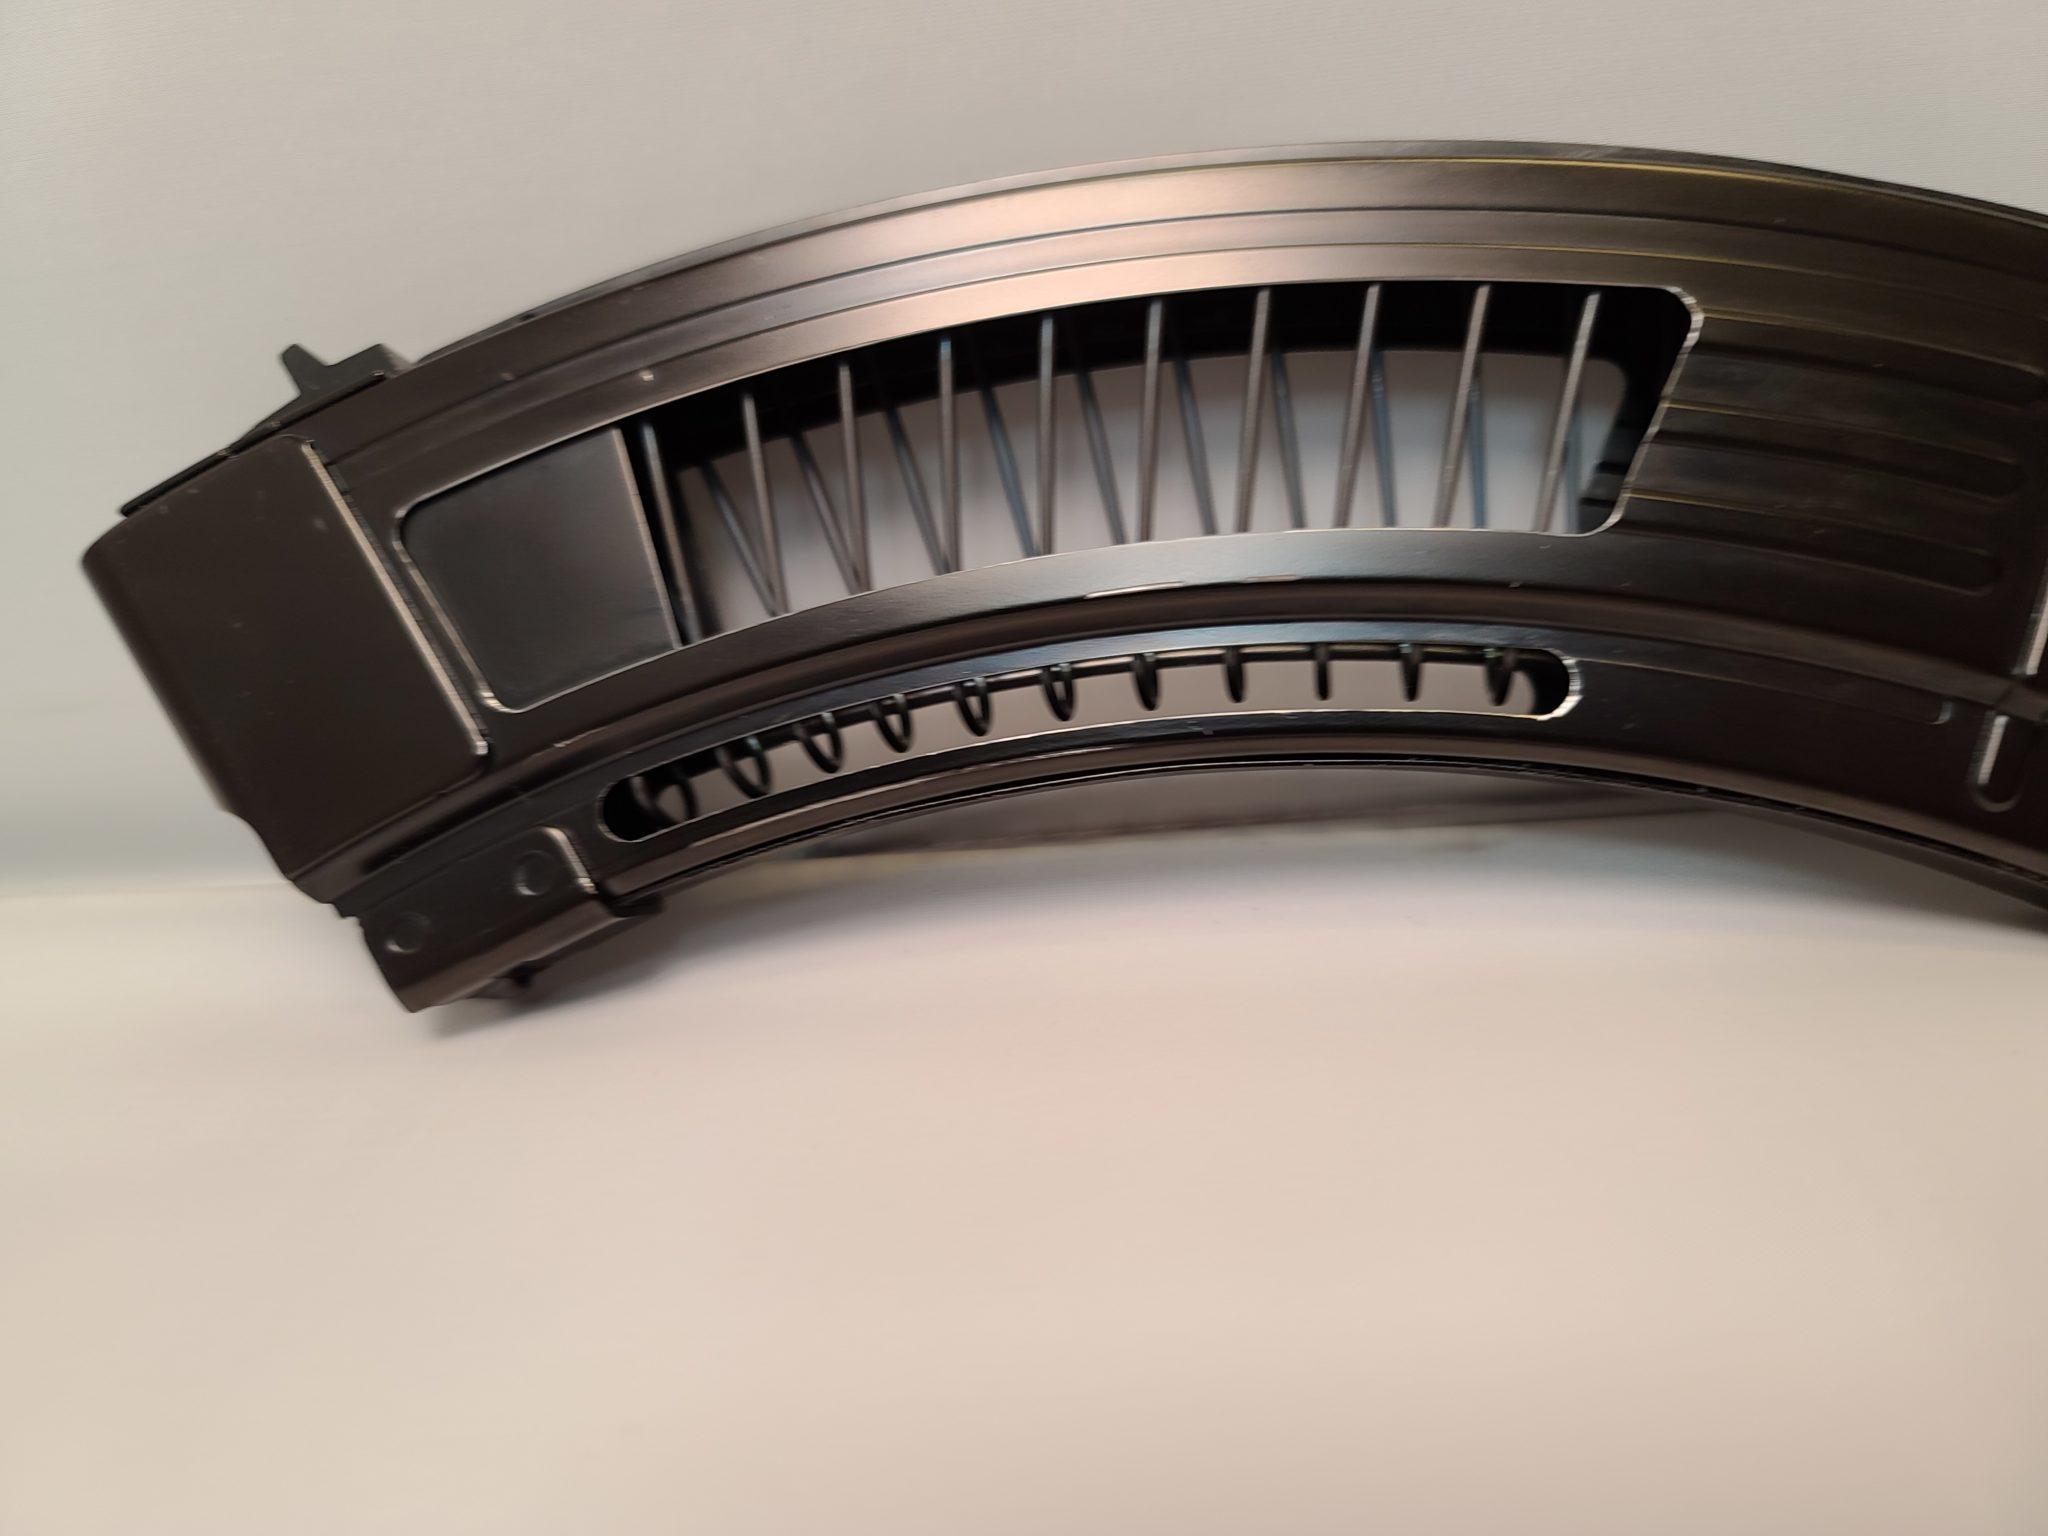 kalashnikov usa 30 round window ak-47 magazine 7.62x39mm